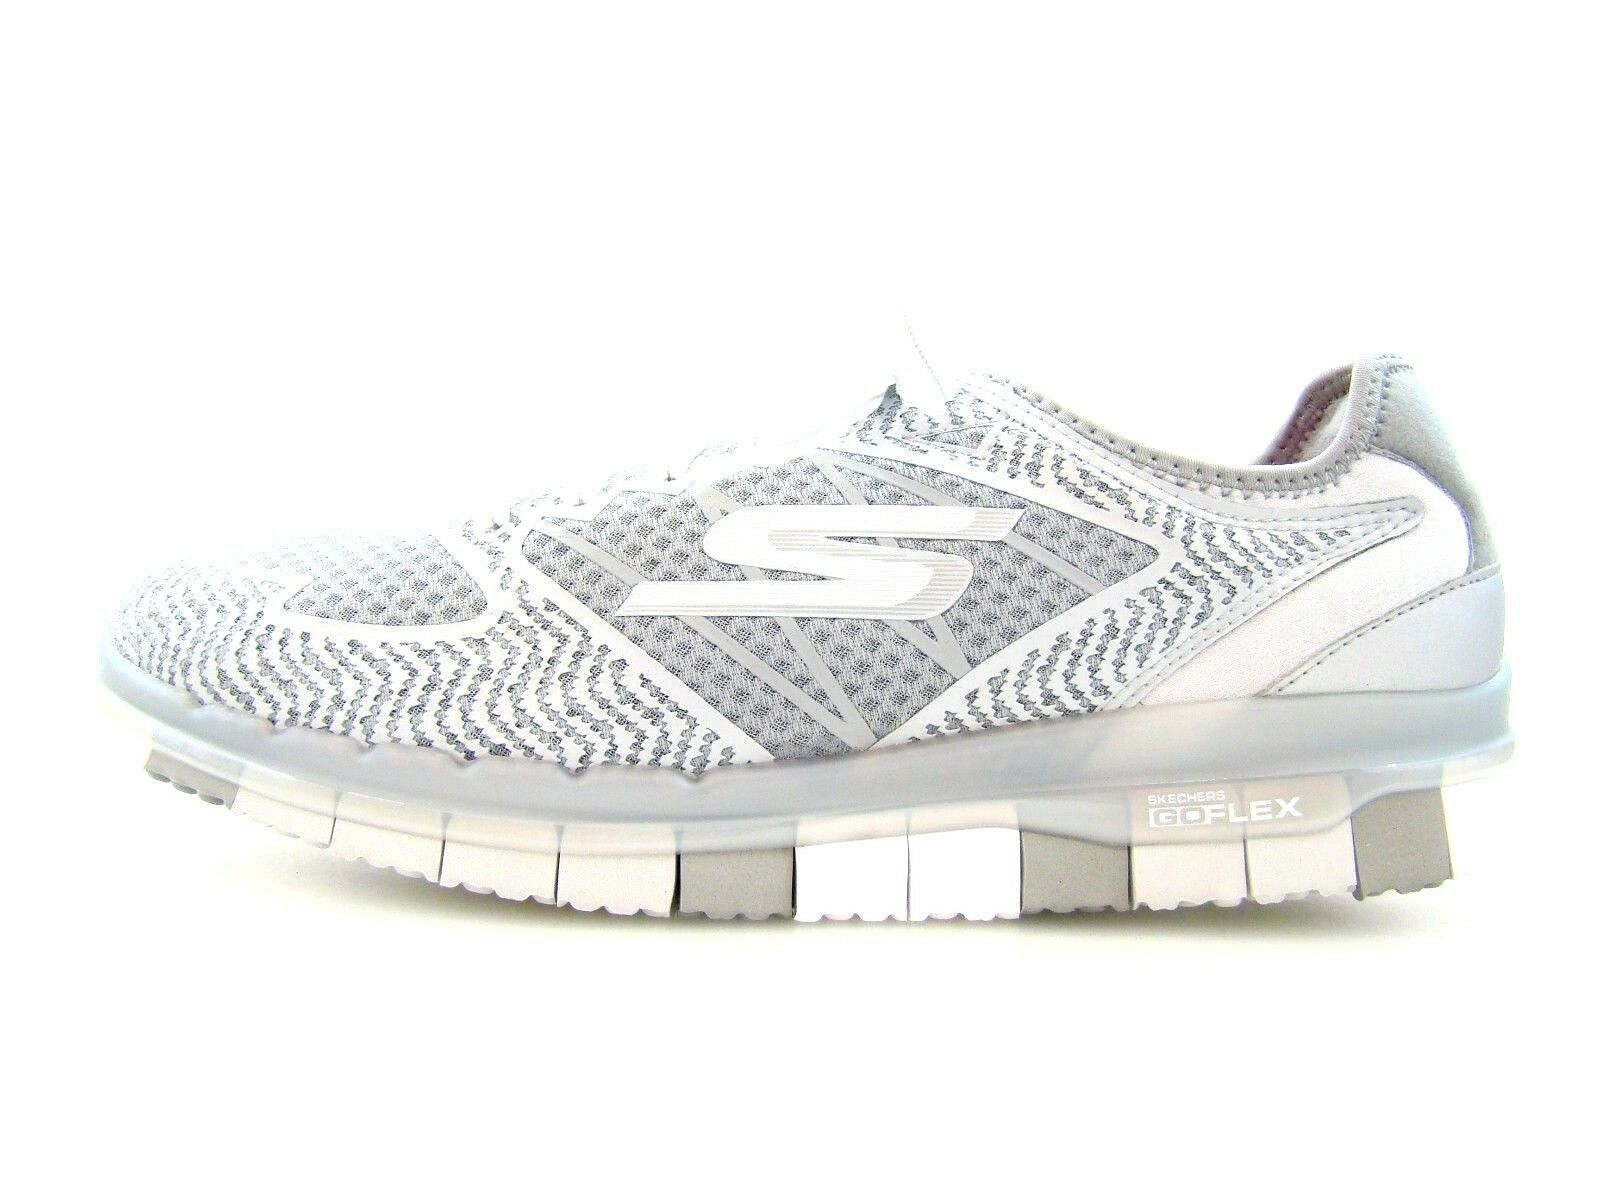 2826 SKECHERS Sneaker 40 Sohle NEU Turnschuhe komfortabel flexible Sohle 40 grau weiß dac85d